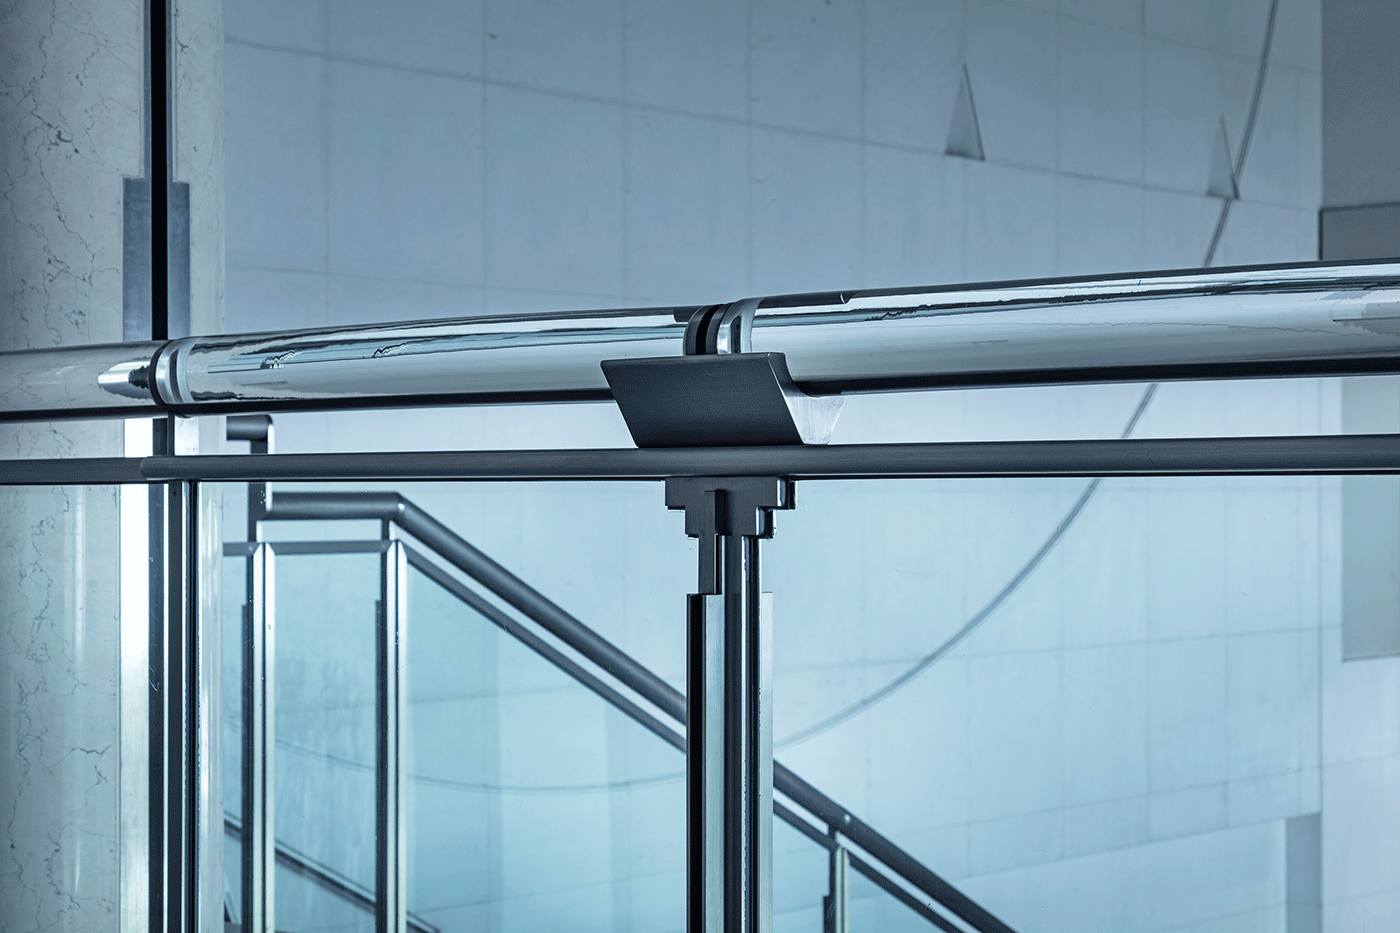 The National Museum of Modern Art, Kyoto stairway rails. Photo by Hasegawa Kenta